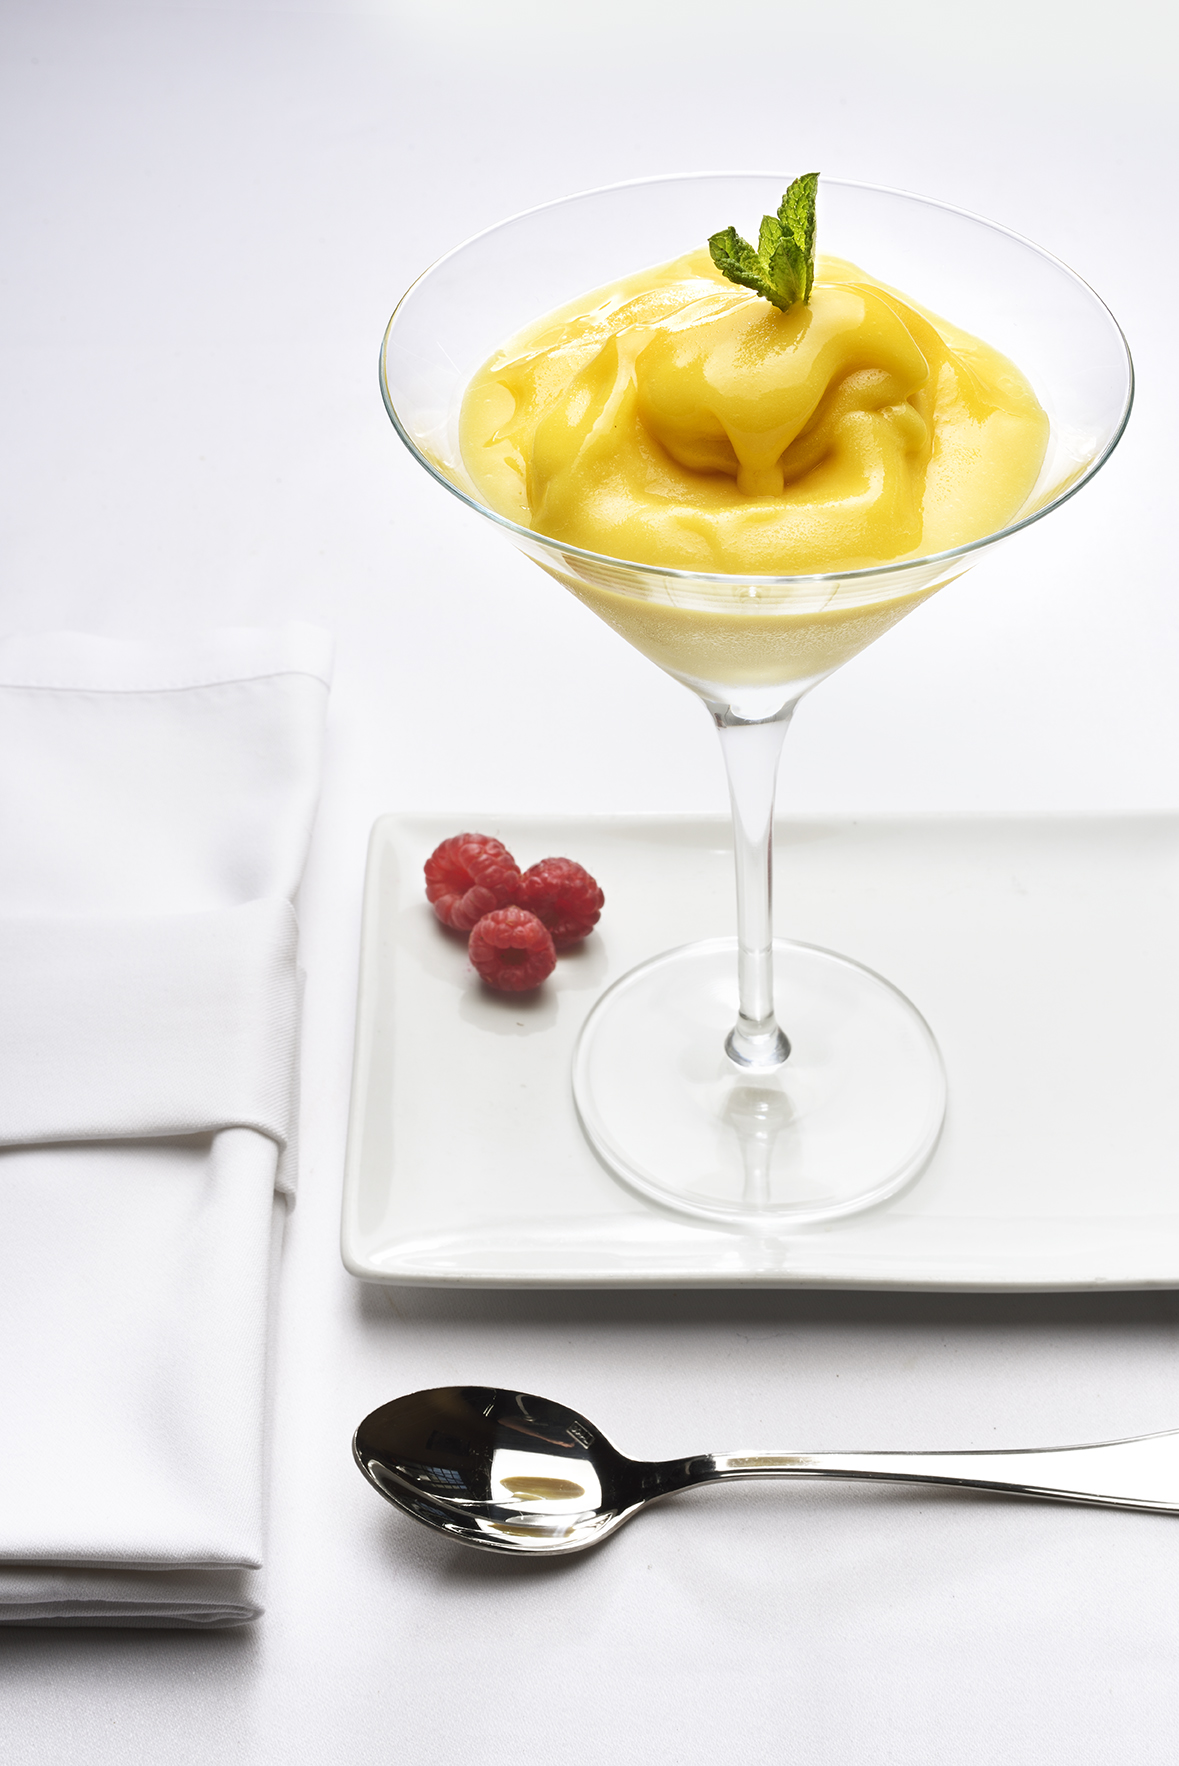 http://sandrorestaurante.com/wp-content/uploads/2017/01/piatto-381.jpg